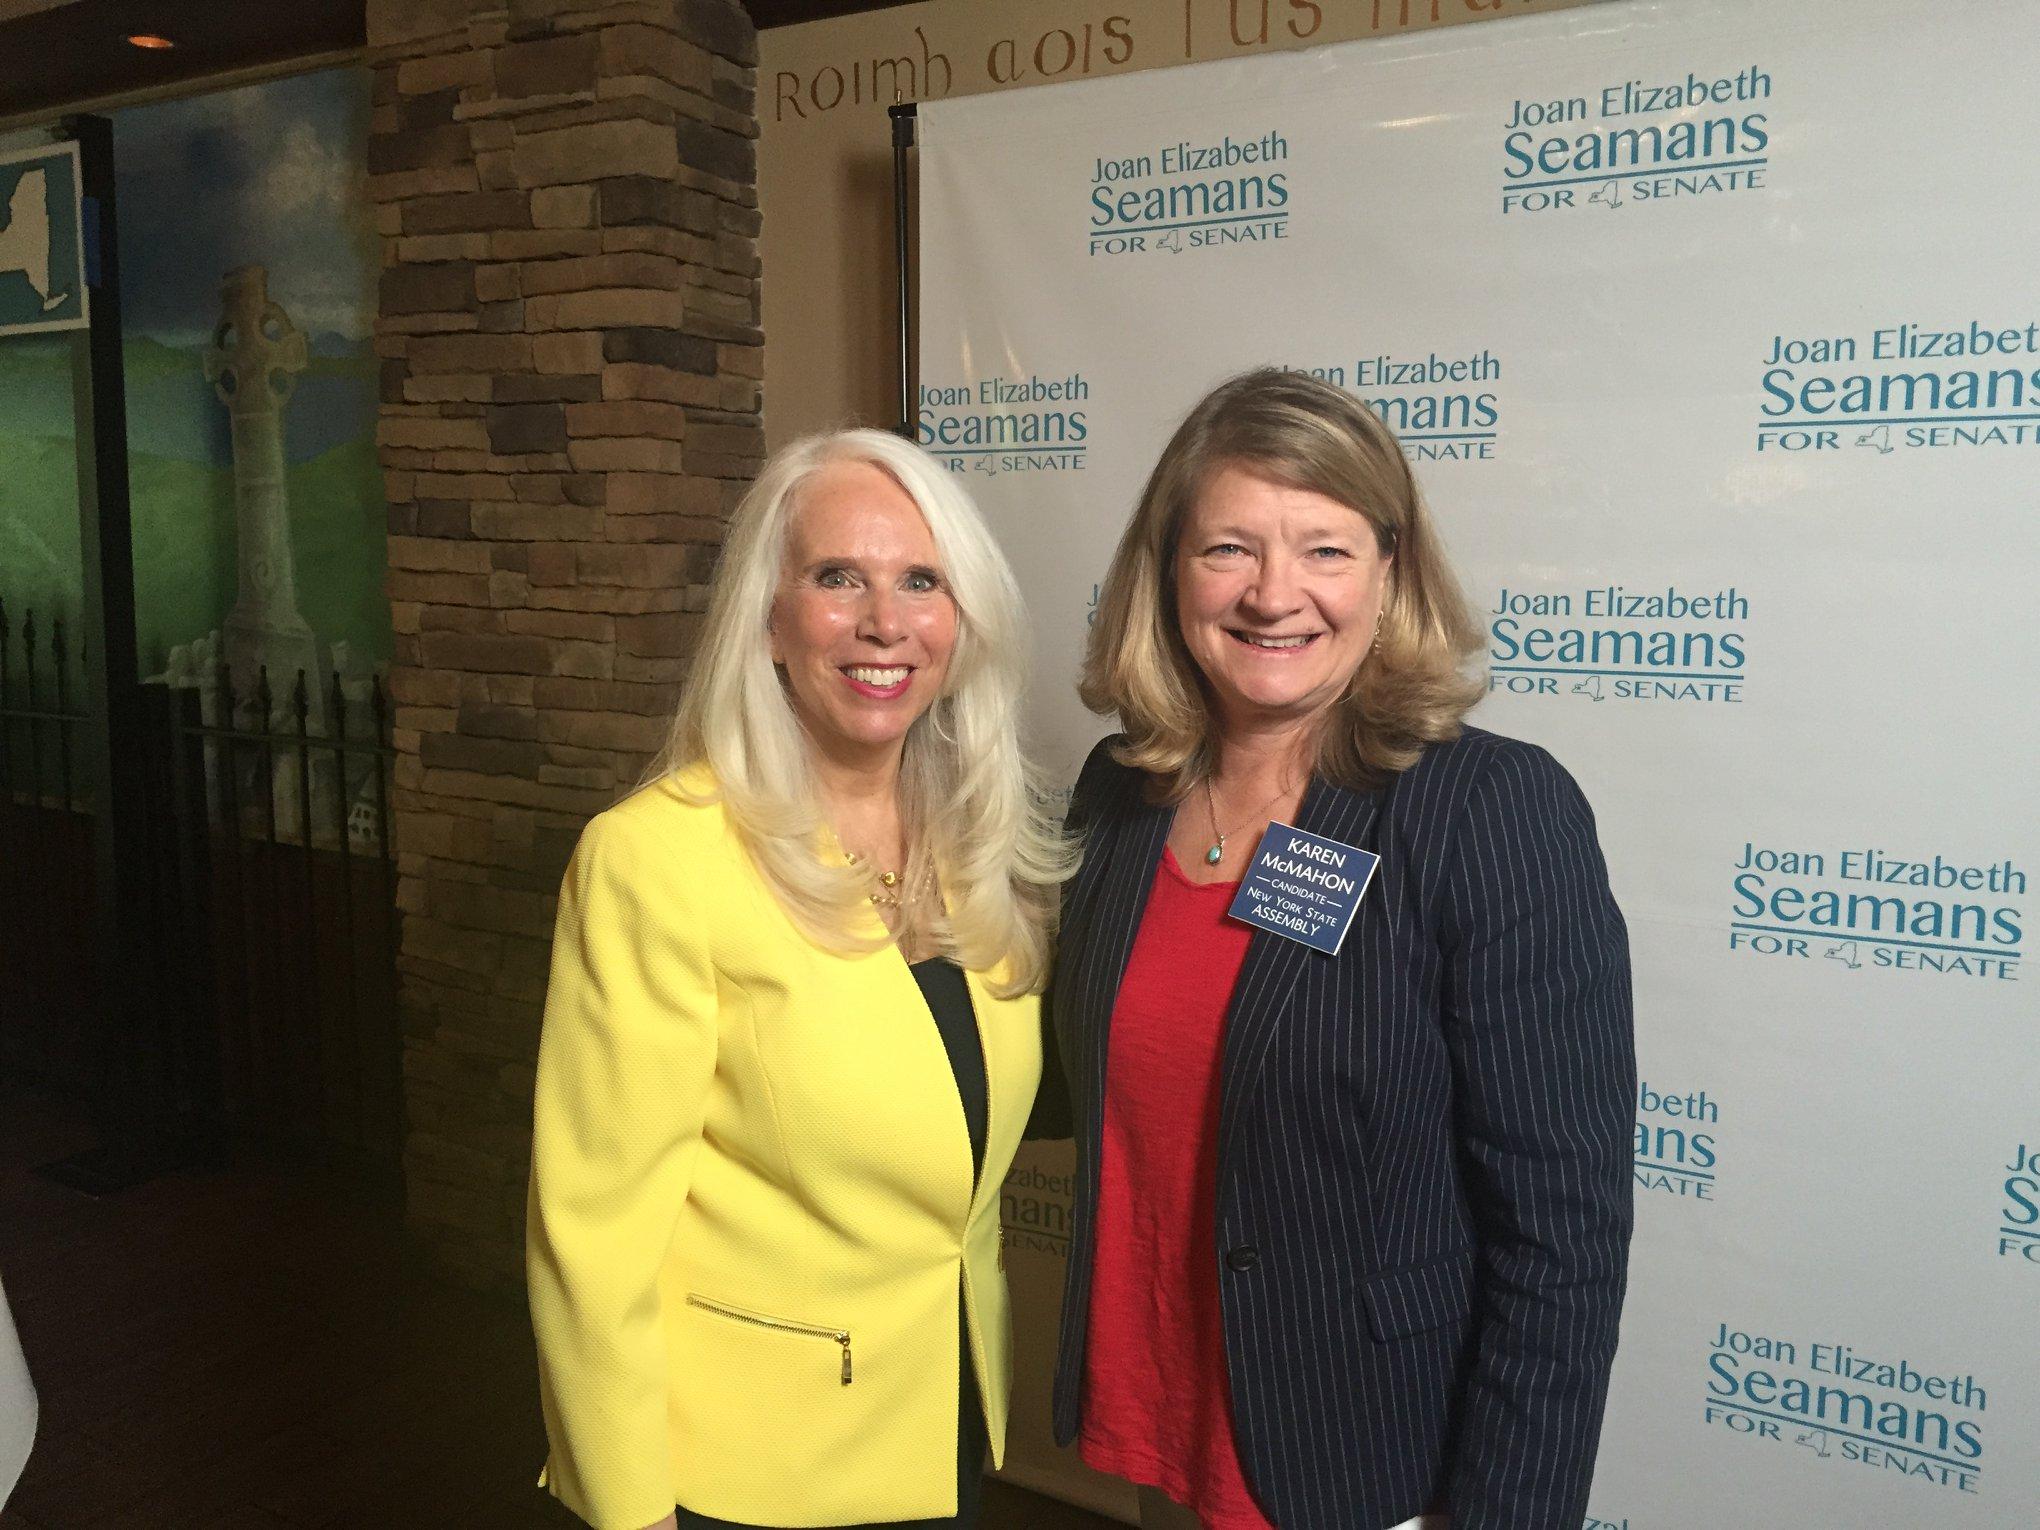 Joan Elizabeth Seamans (Left), Karen McMahon (Right)